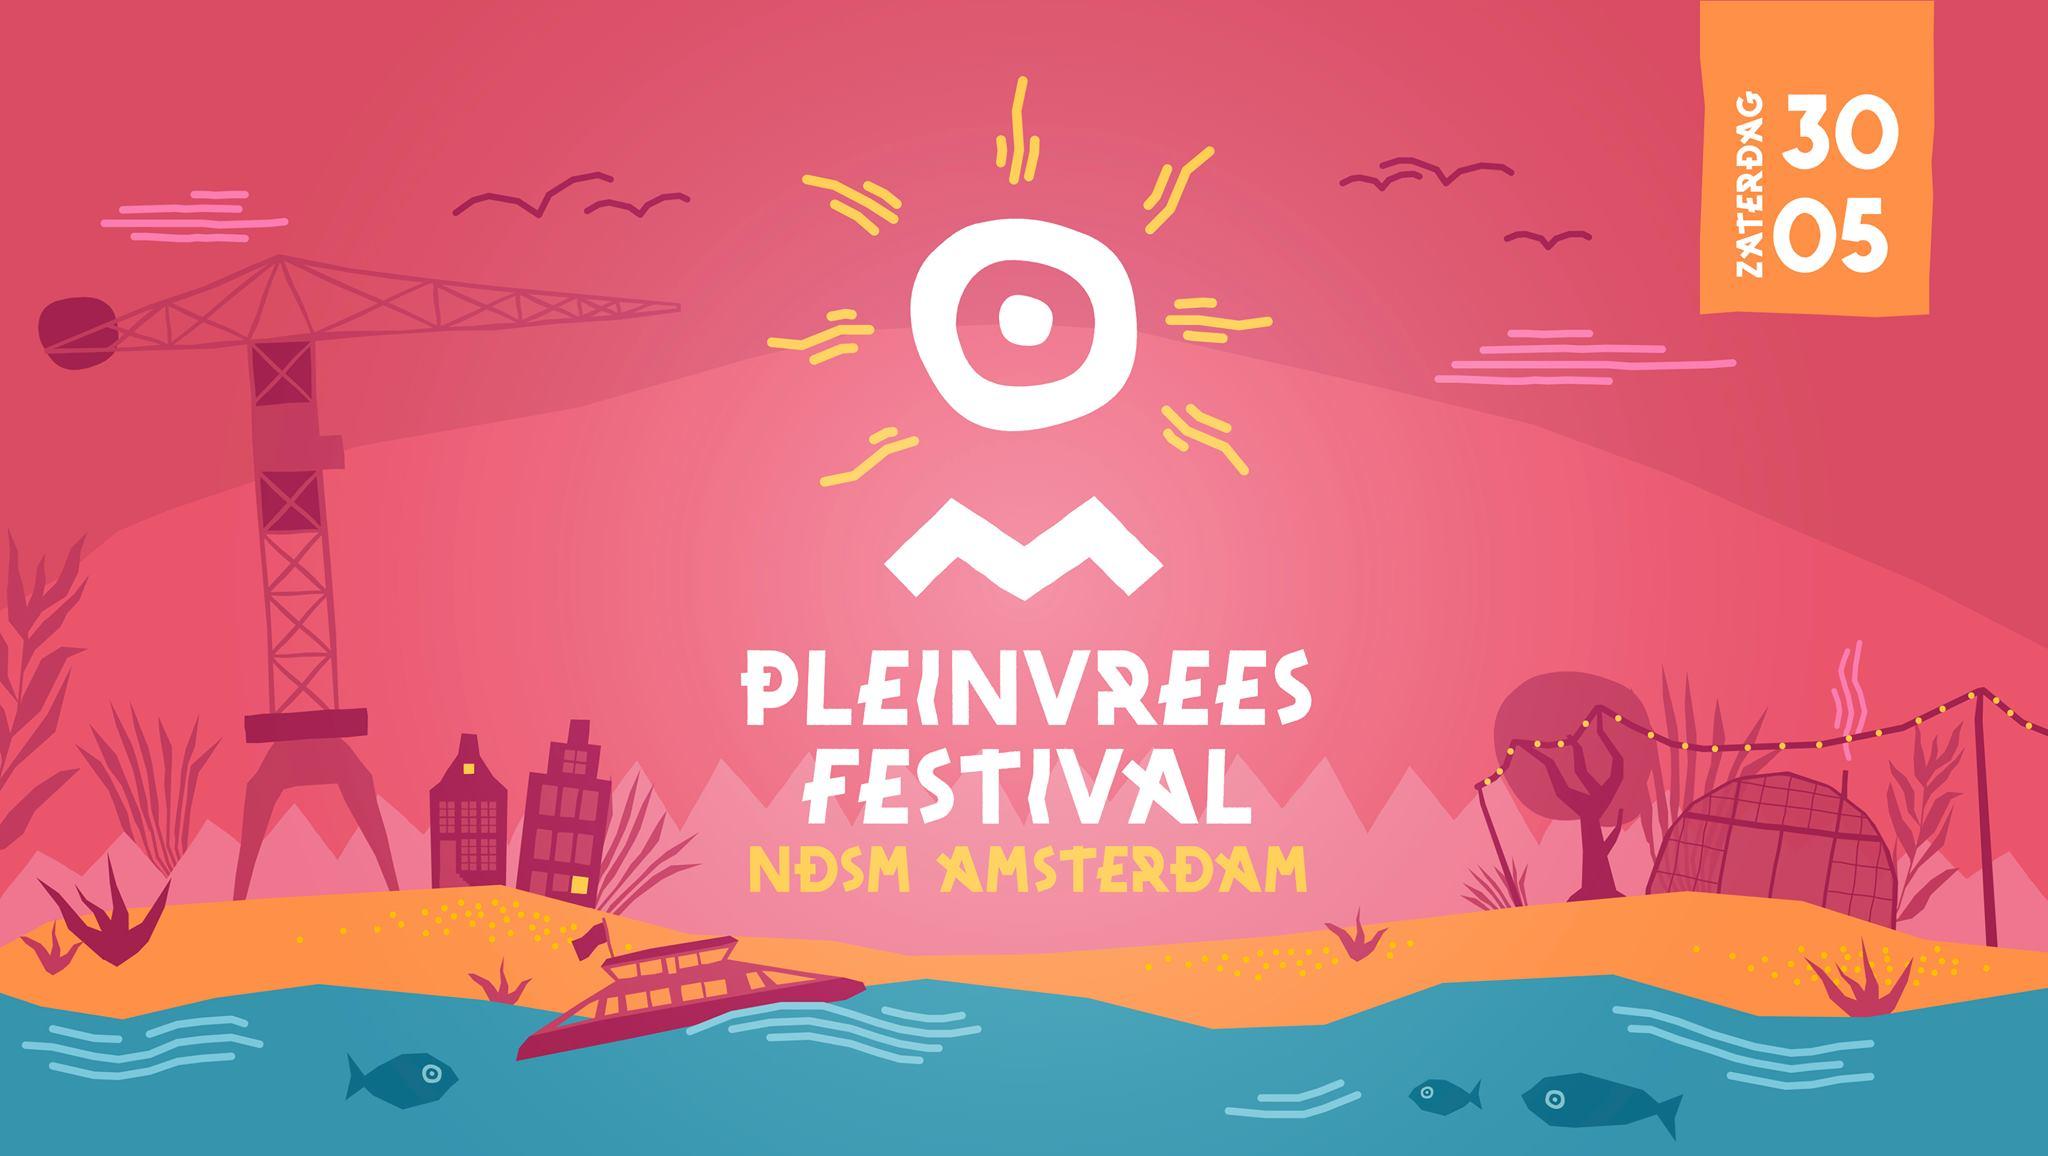 Pleinvrees Festival 2020